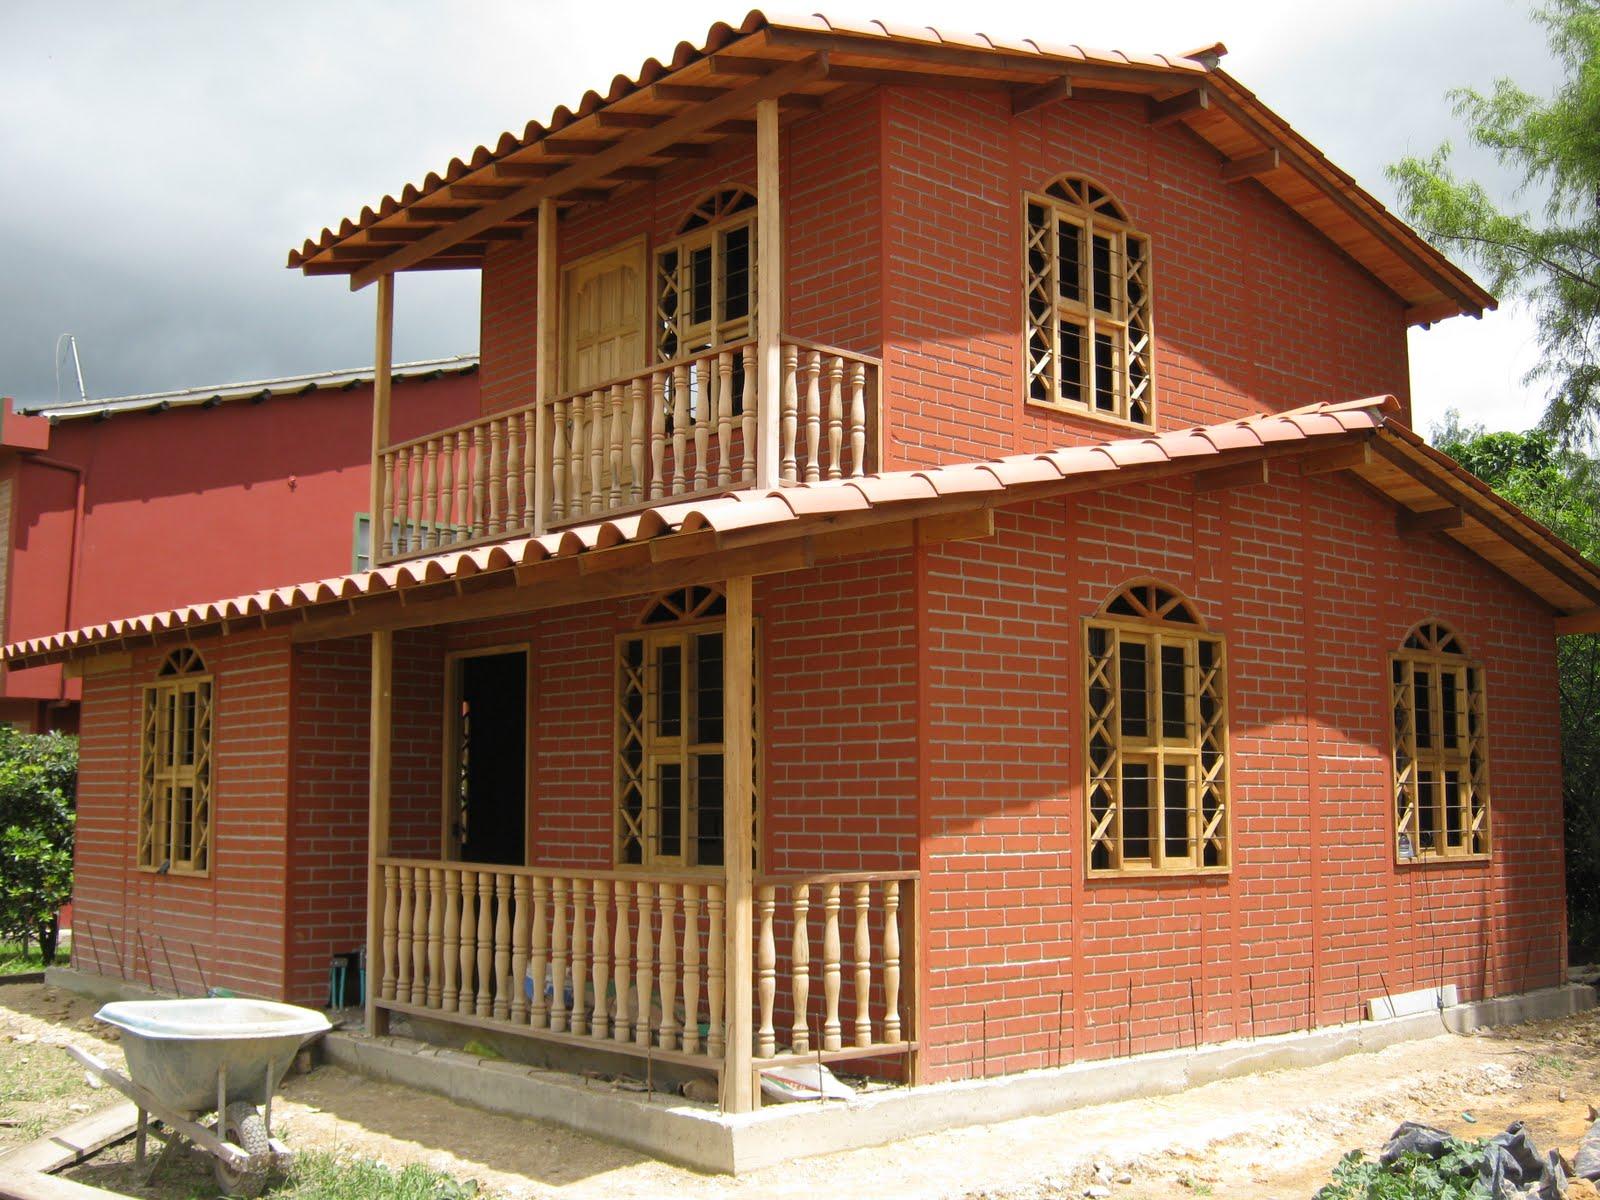 Casas prefabricadas creando viviendas sas septiembre 2010 - Casas modulares prefabricadas baratas ...